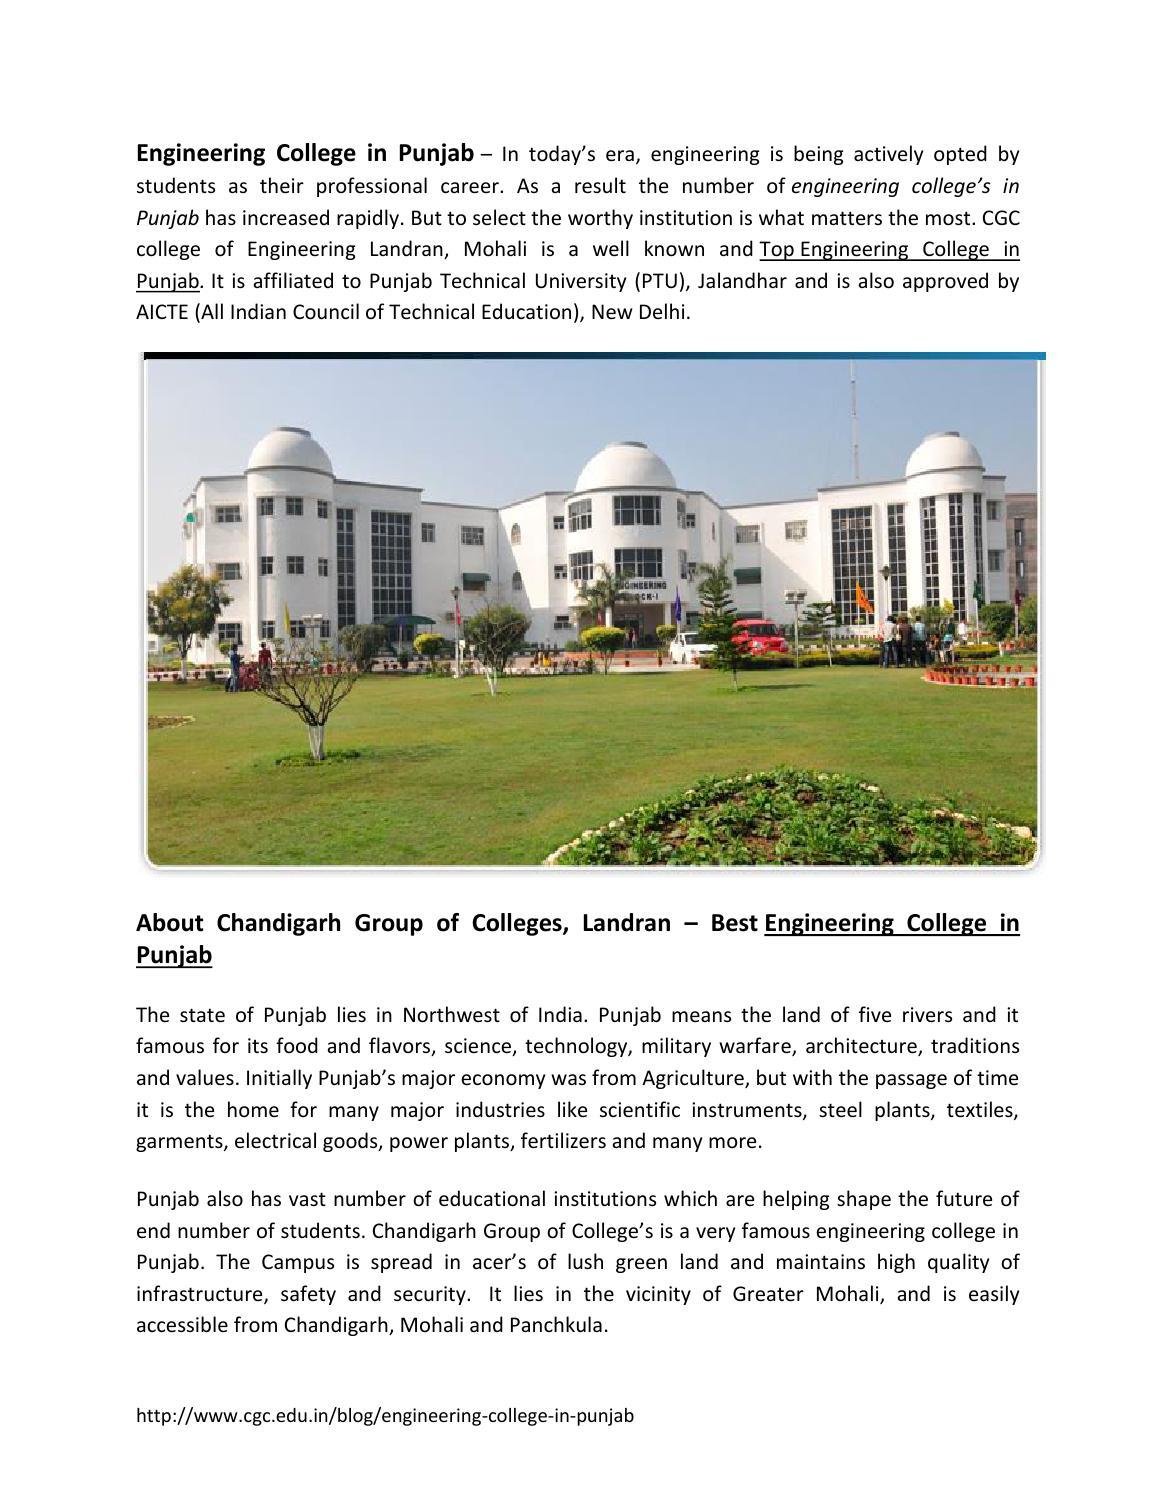 Engineering college in punjab by CGC Landran - issuu